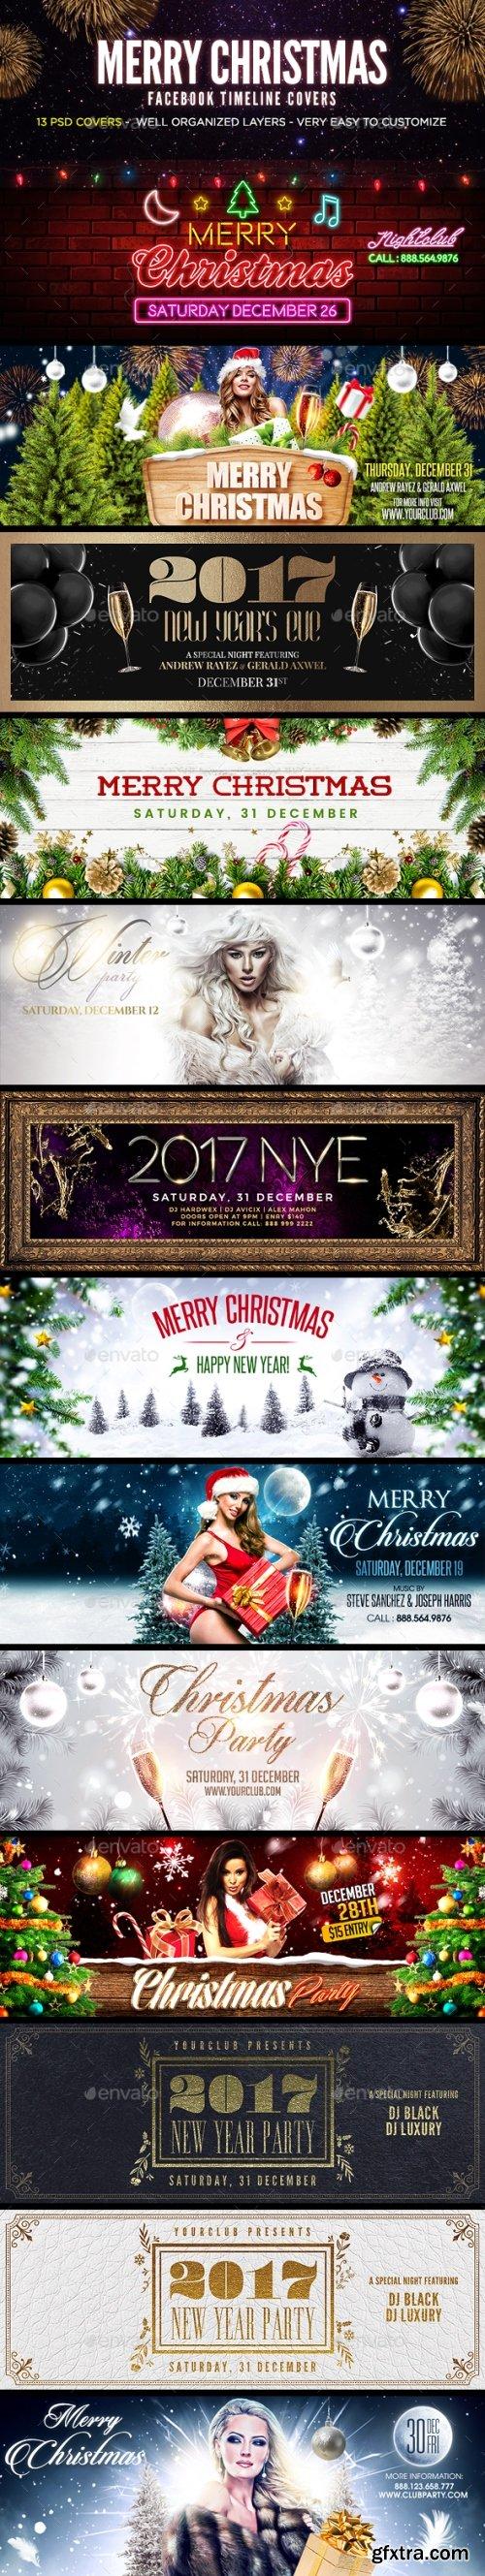 Graphicriver - Merry Christmas Facebook Cover 19166066